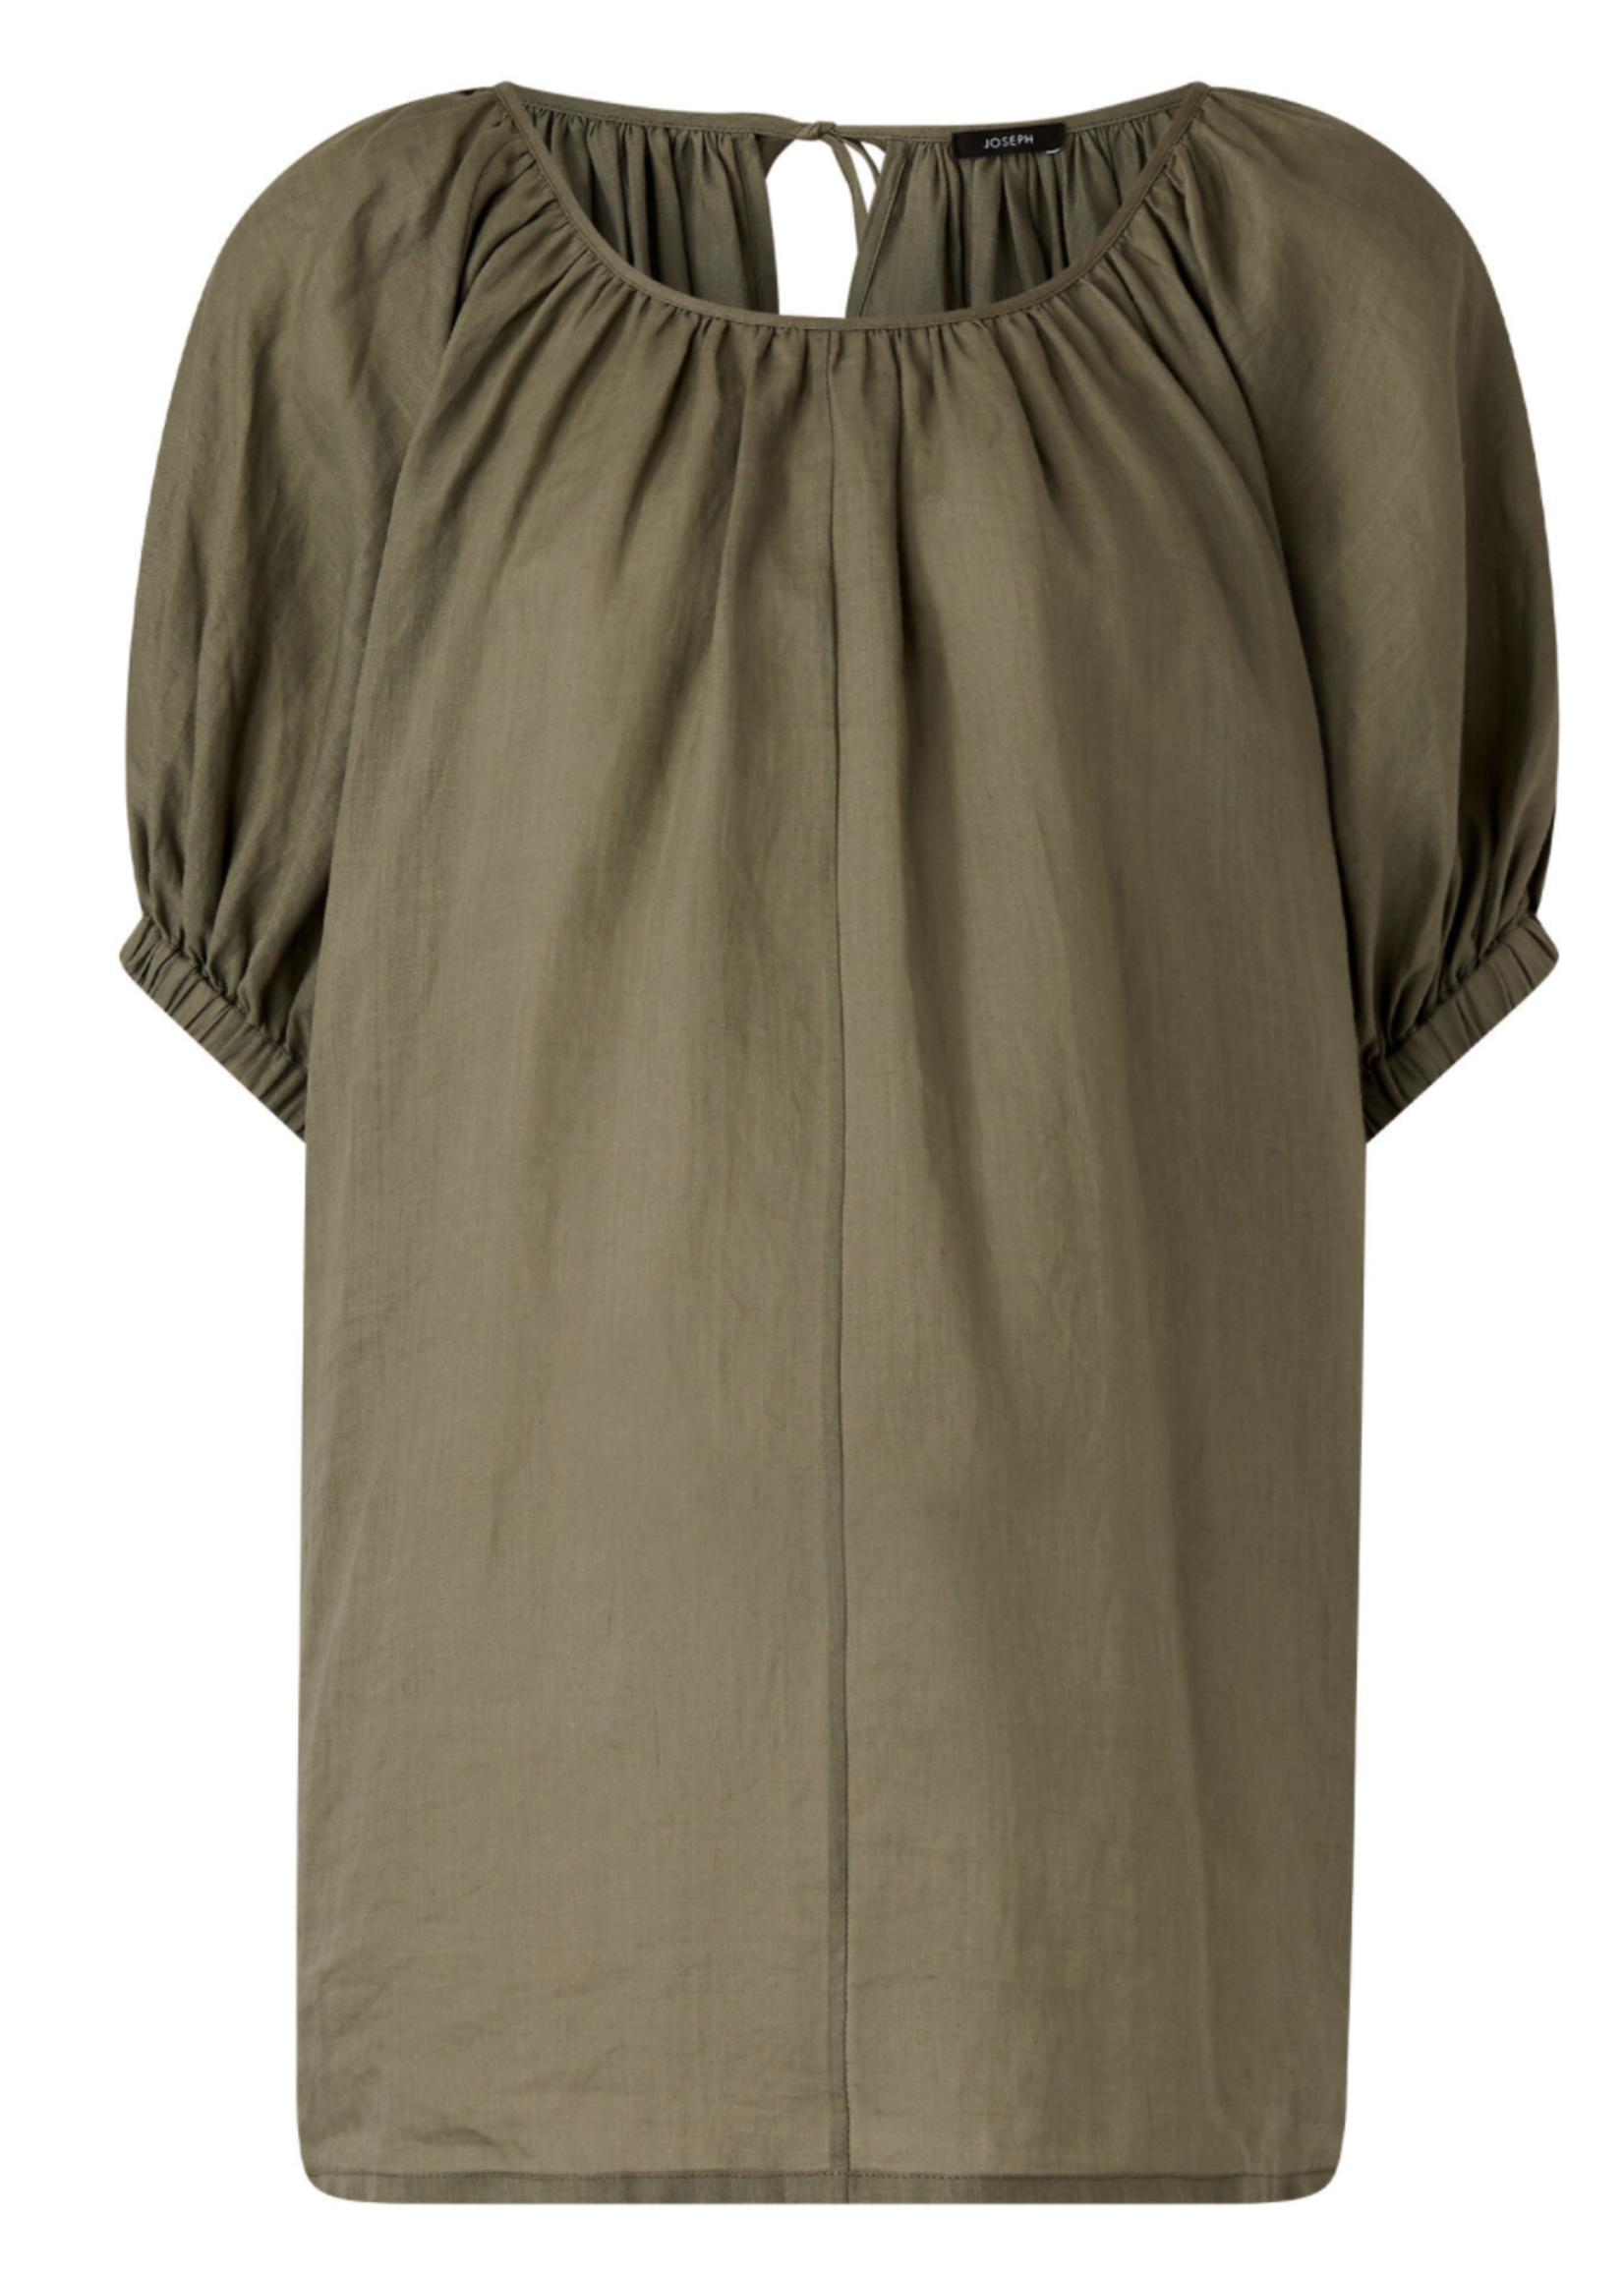 Joseph joseph baidy ramie vole short sleeve top , argile